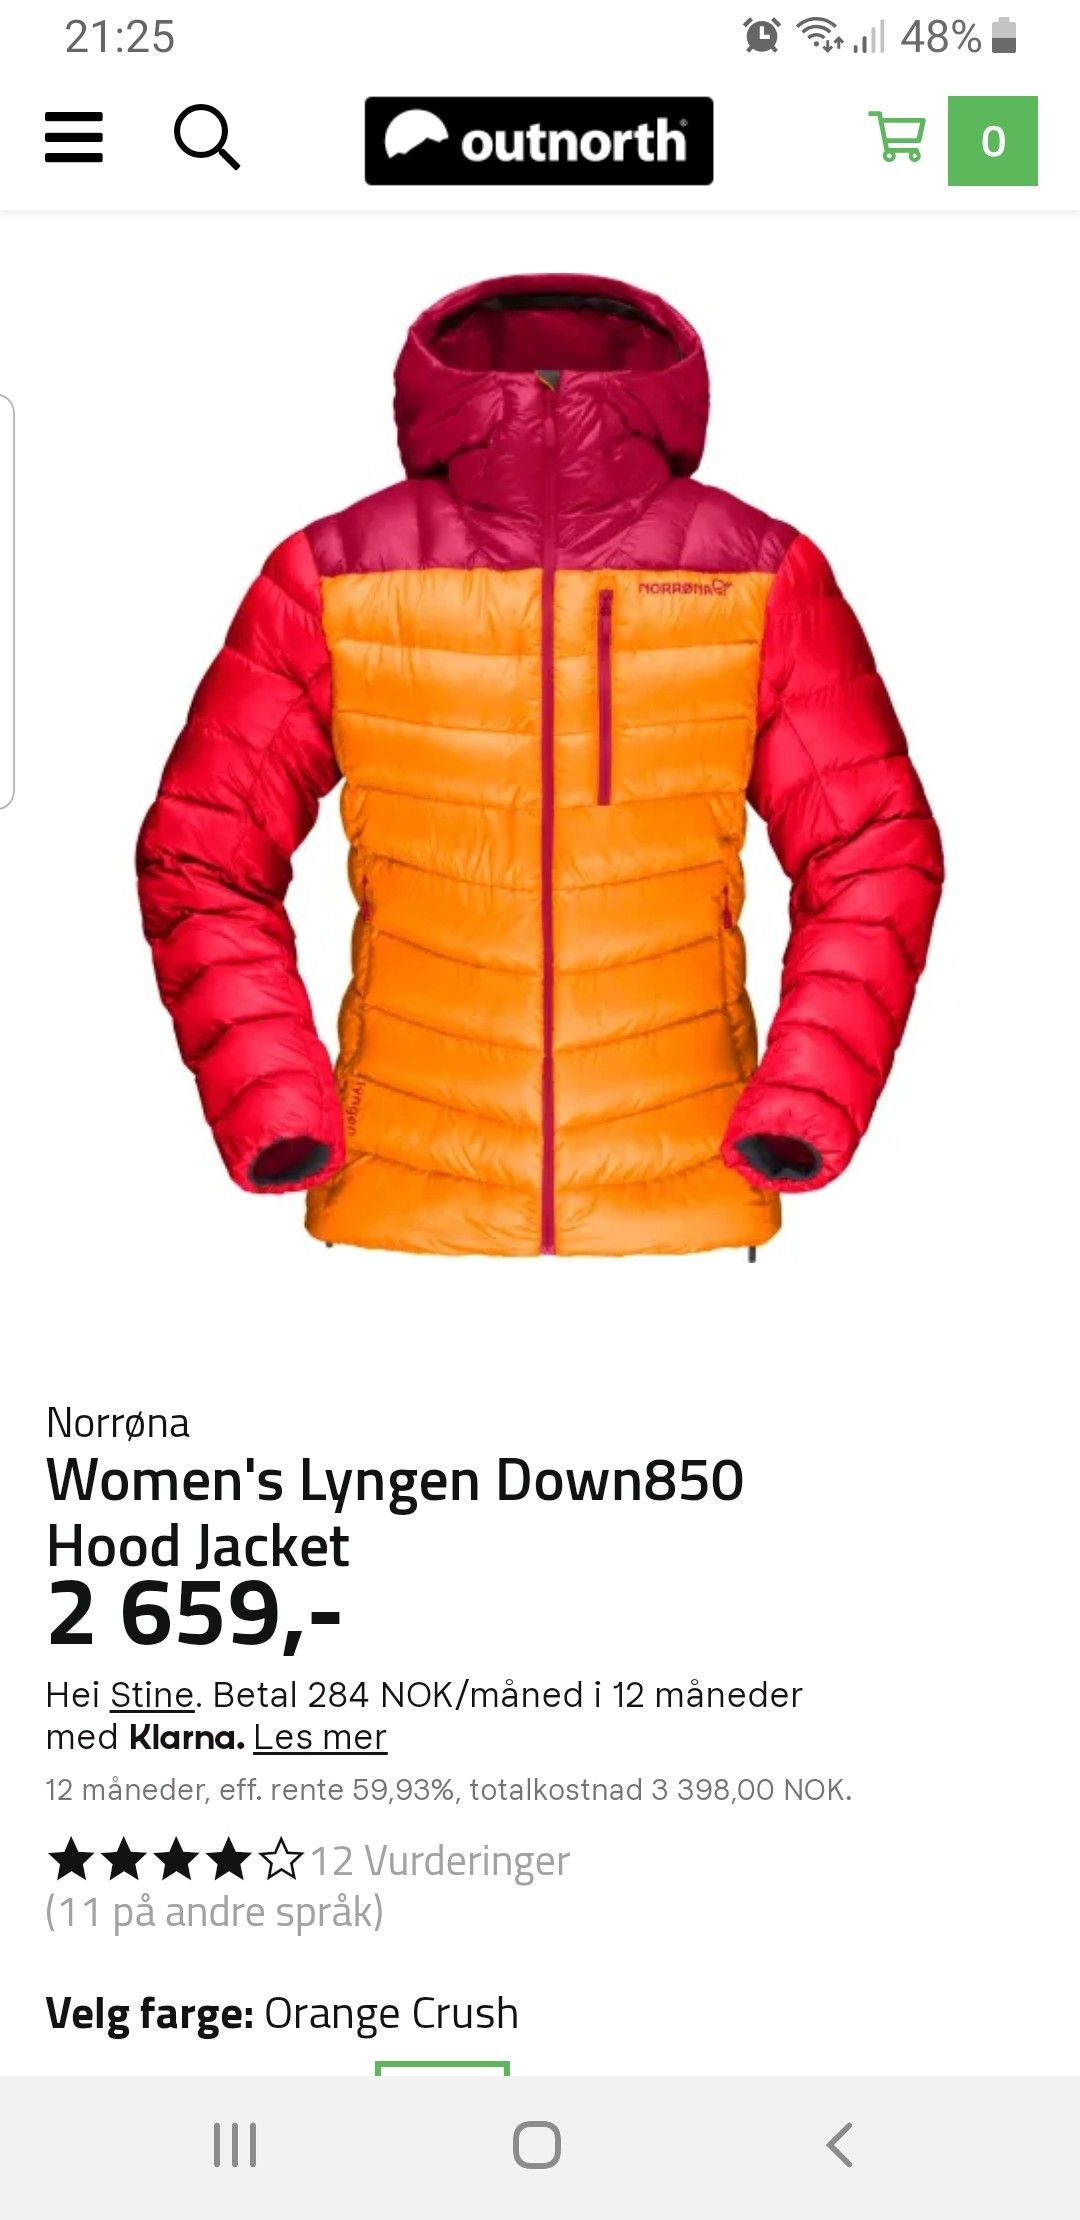 Kjøp Norrøna Men's Lyngen Down850 Hood Jacket fra Outnorth